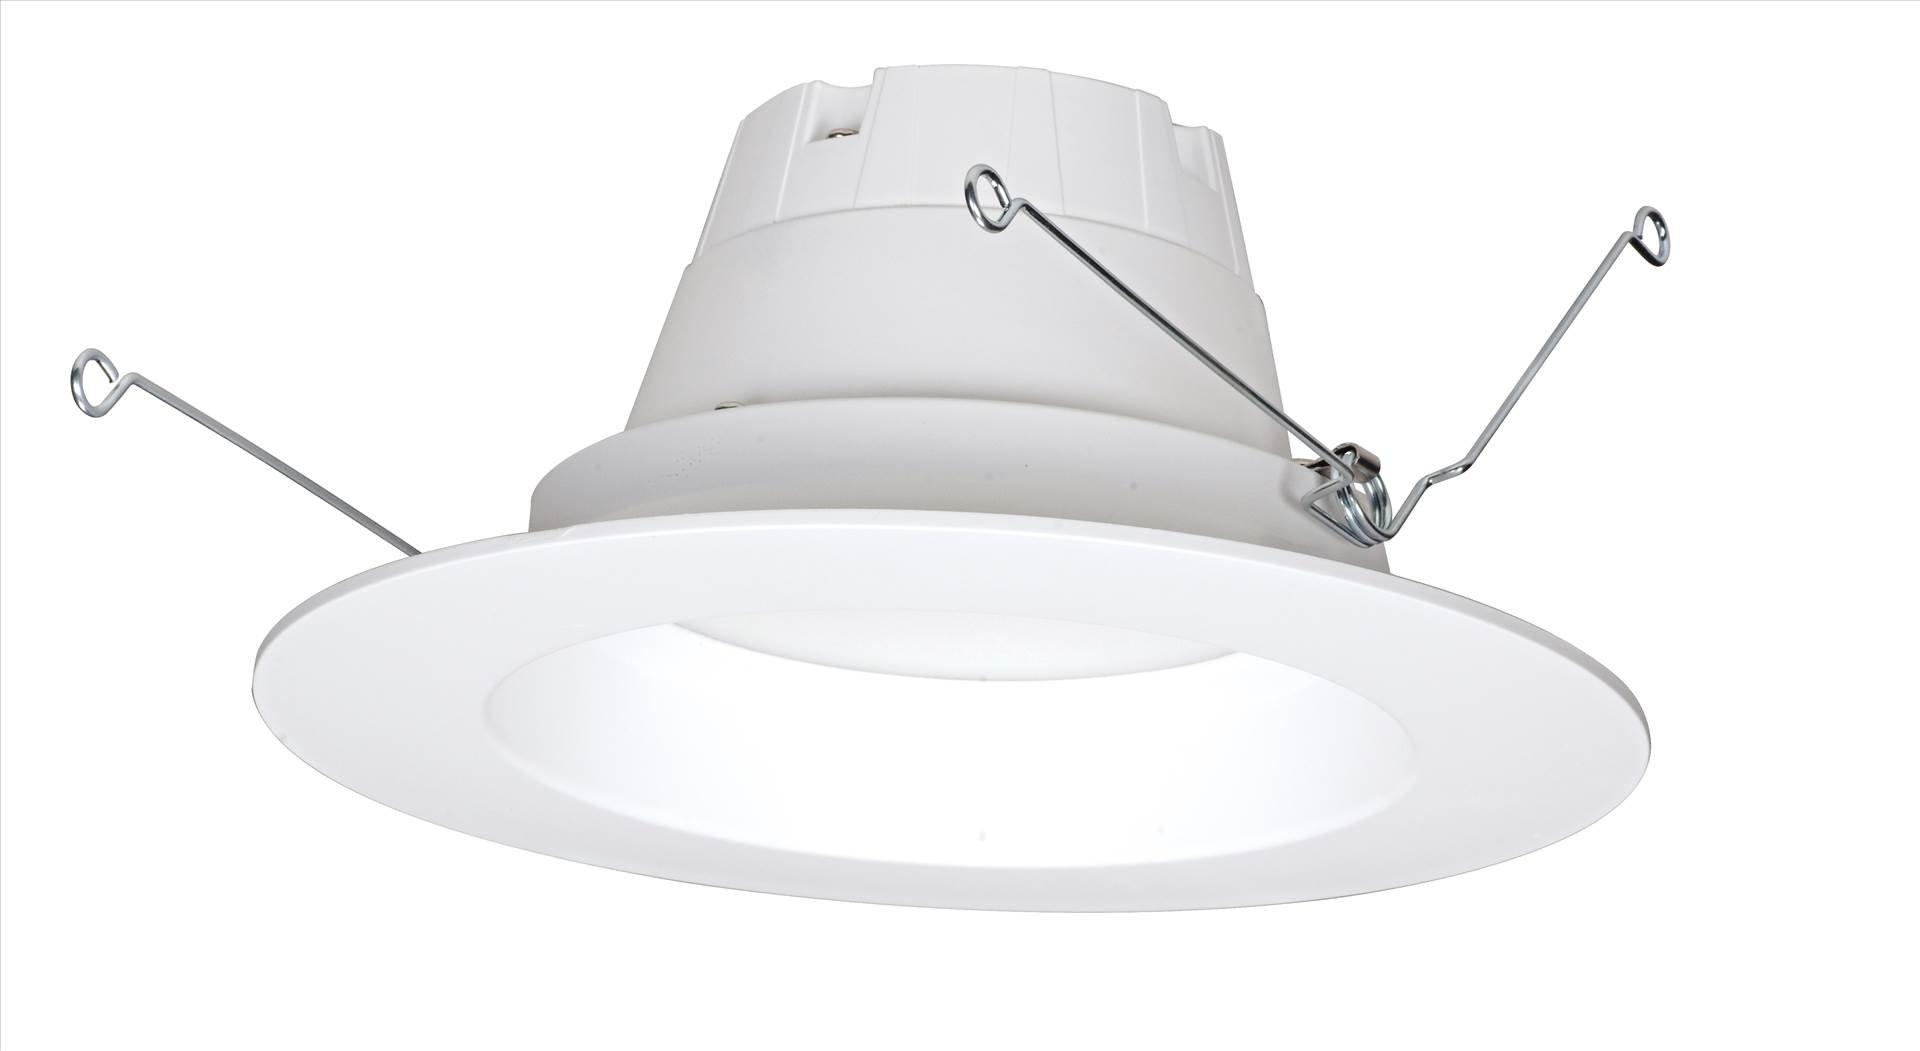 Satco S9314 5''/6'' LED Recessed Downlight Retrofits, White